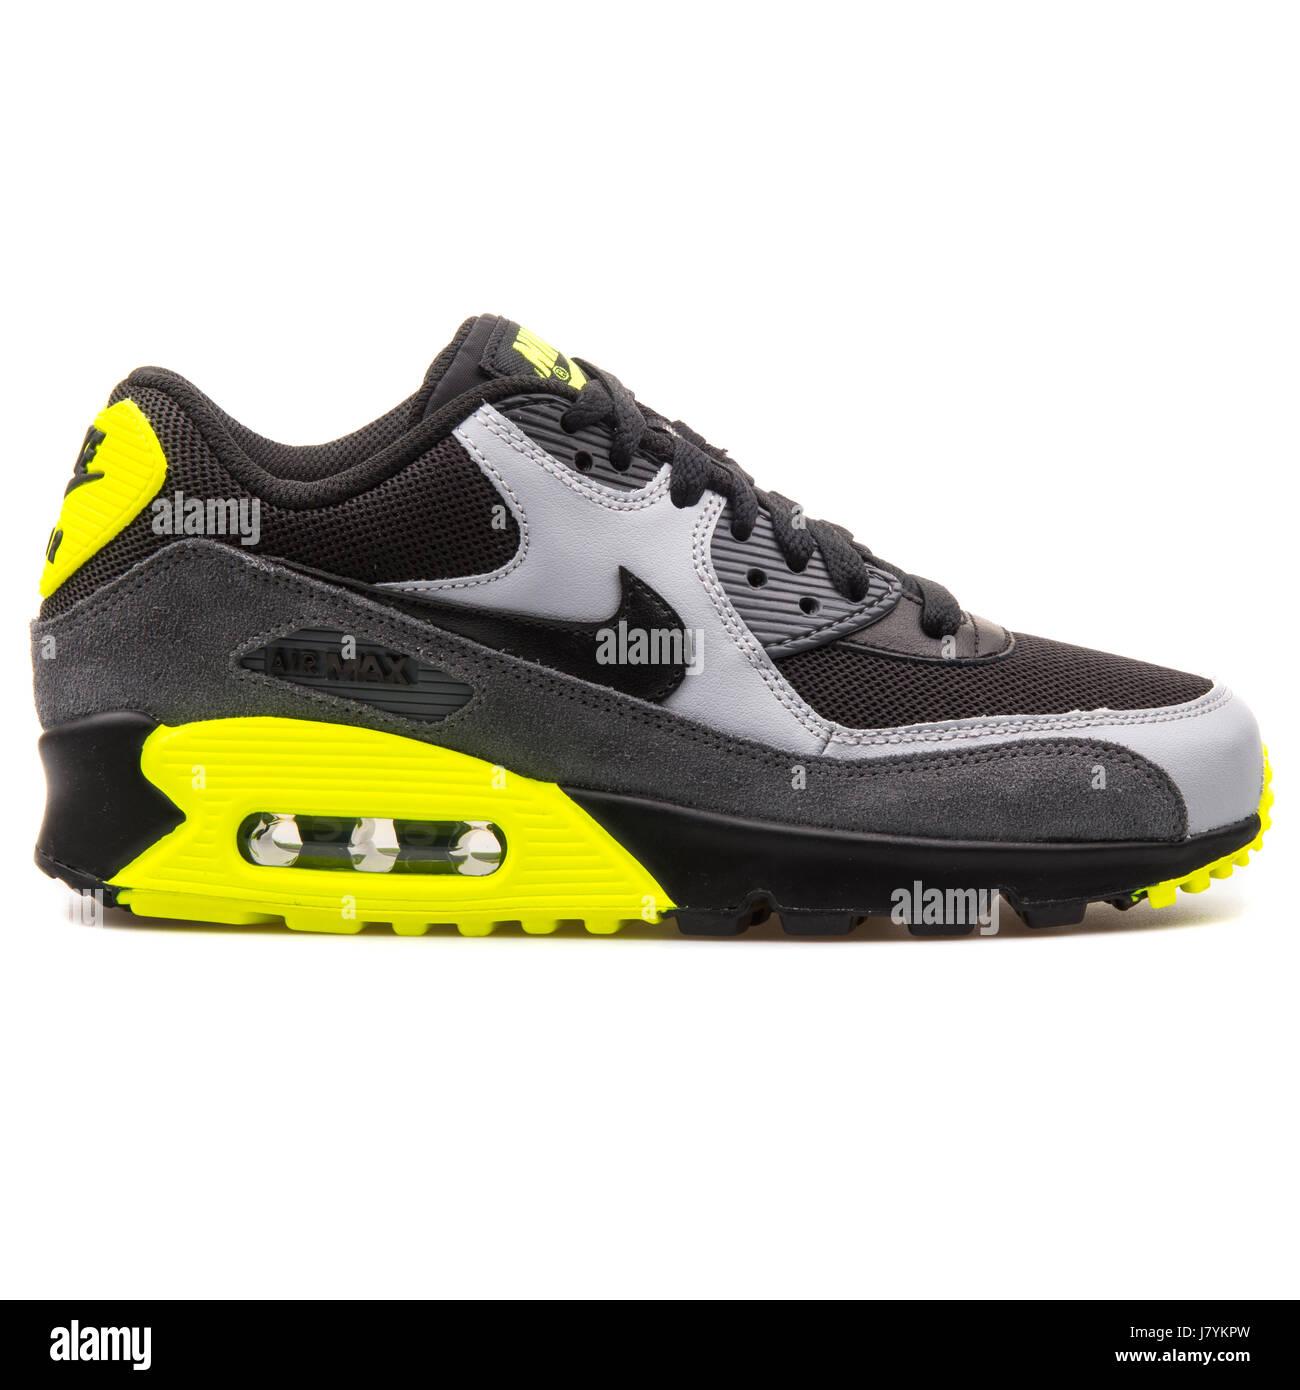 brand new 256f2 2f65a Nike Air Max 90 Mesh (GS) Jugend schwarz grau und gelb Leder-Sneakers -  724824-002